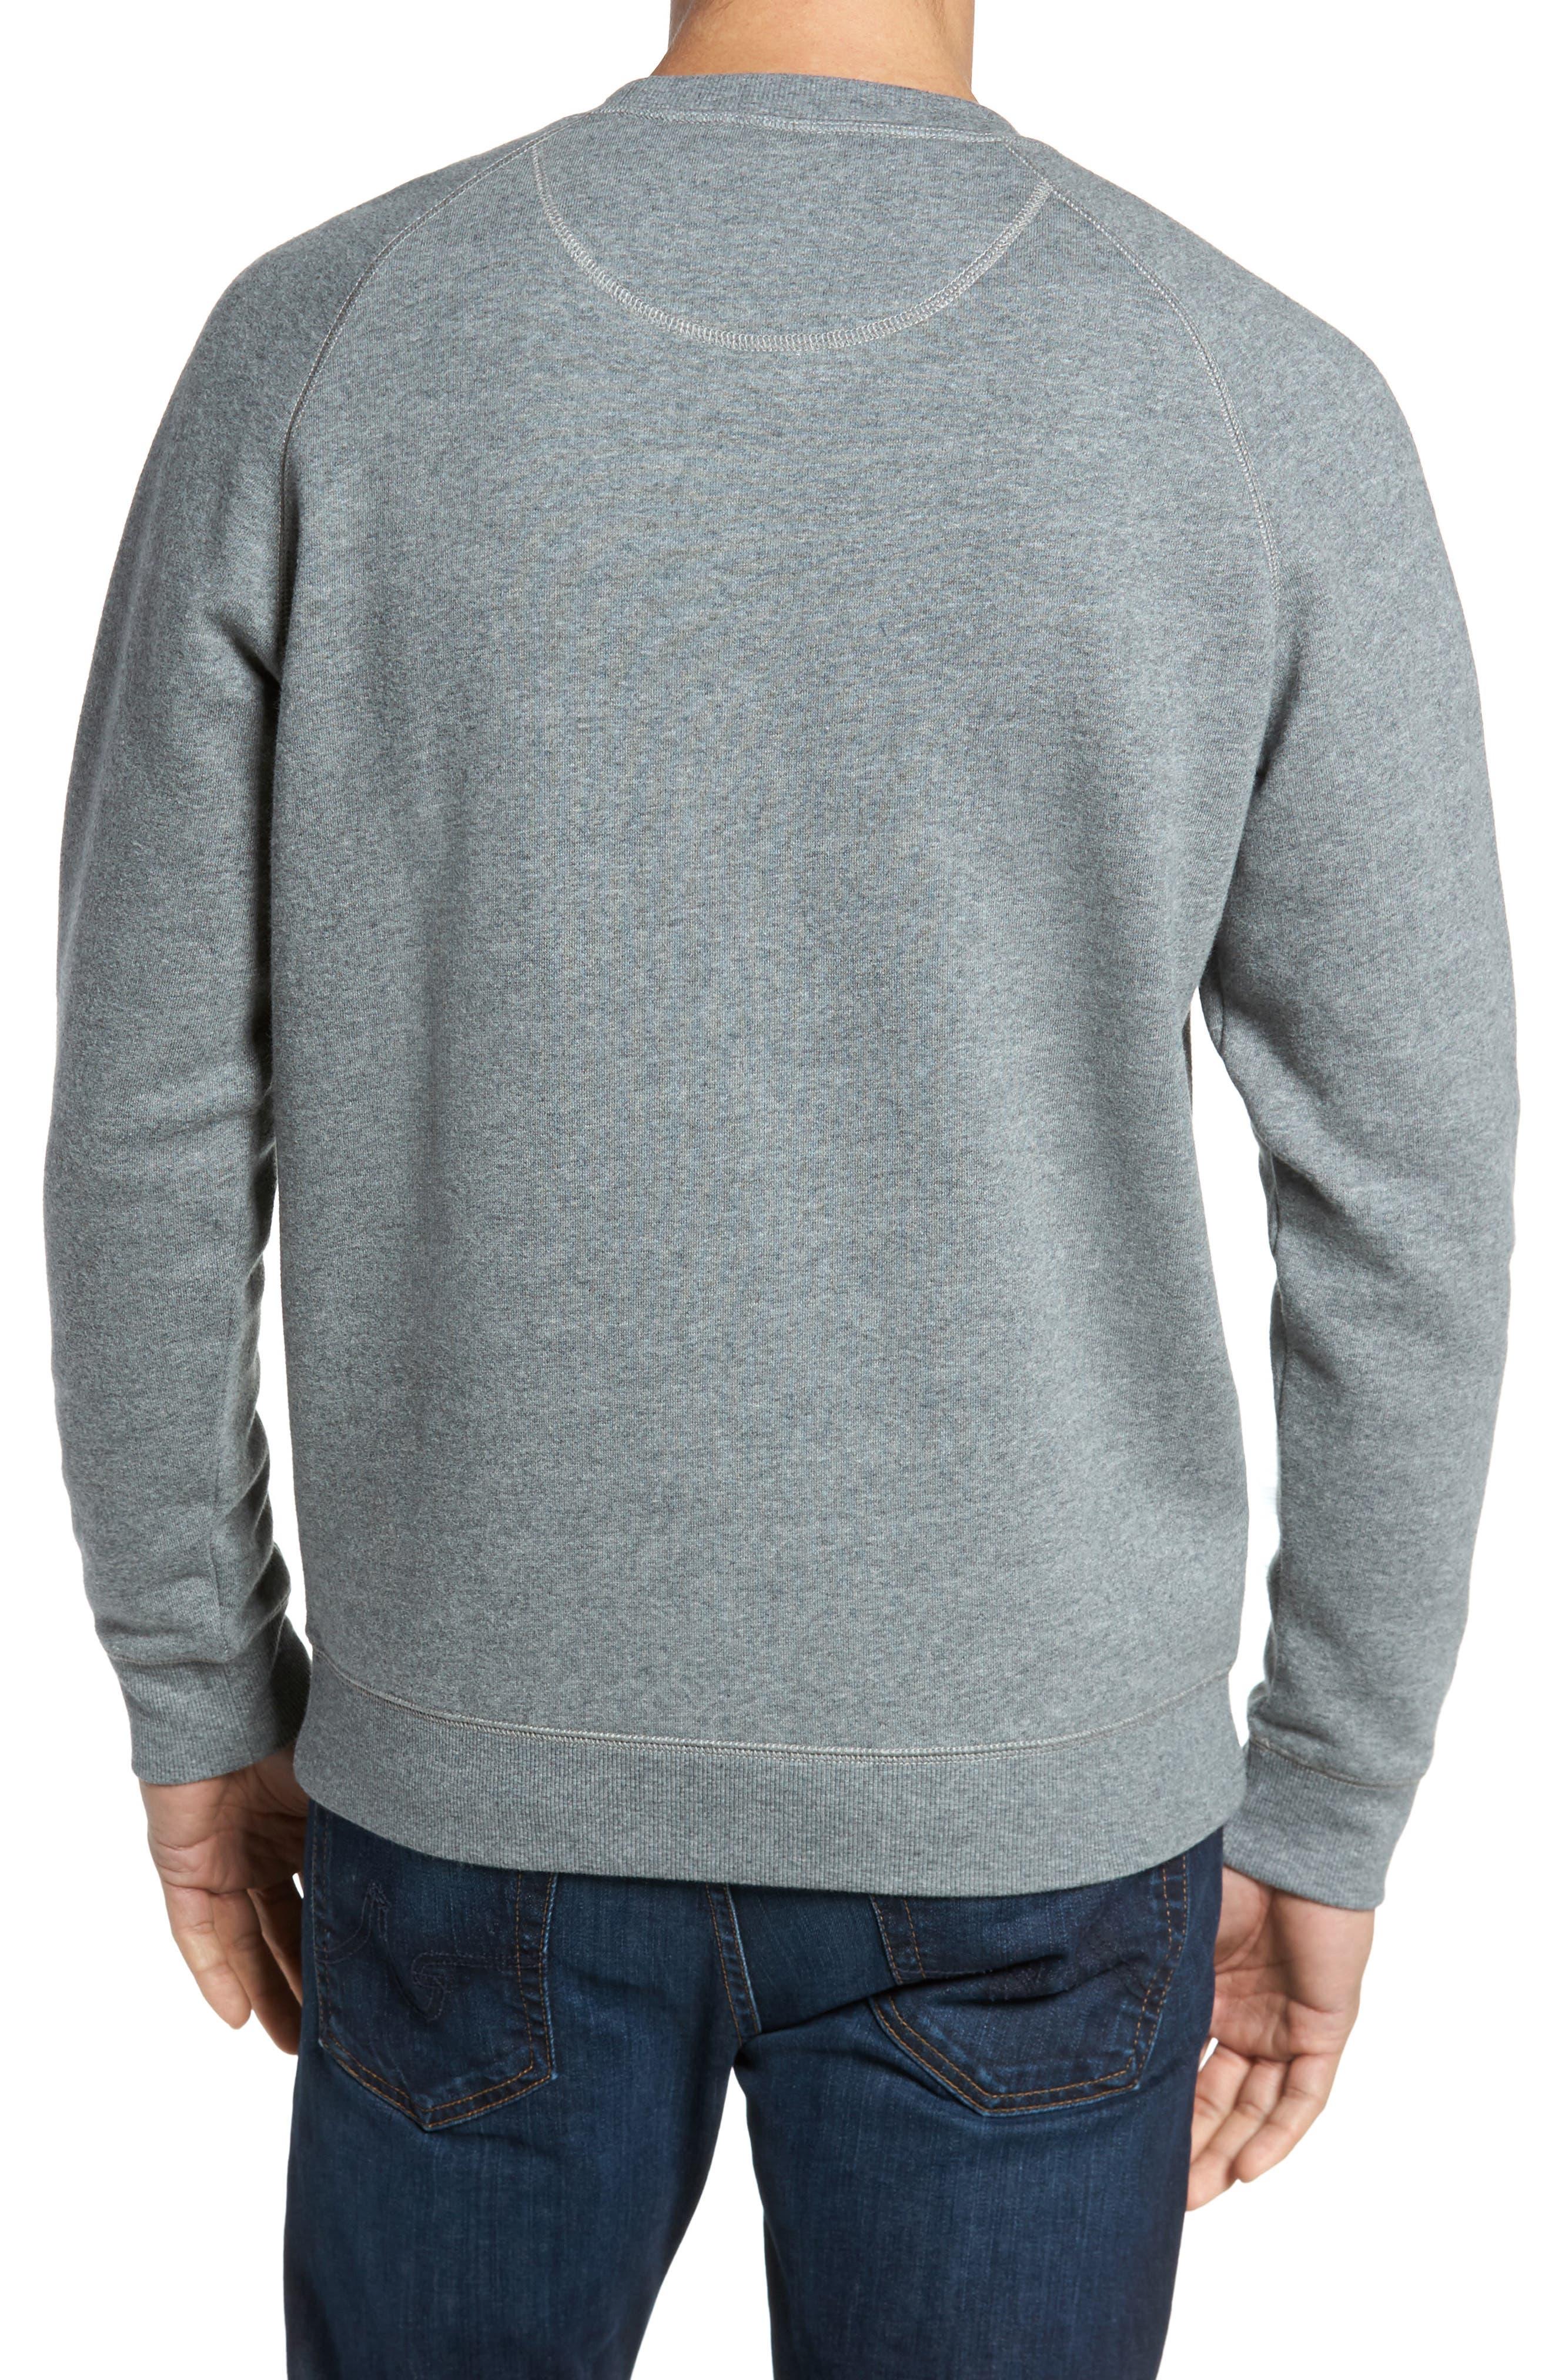 Fleece Sweatshirt,                             Alternate thumbnail 2, color,                             Grey Paloma Heather